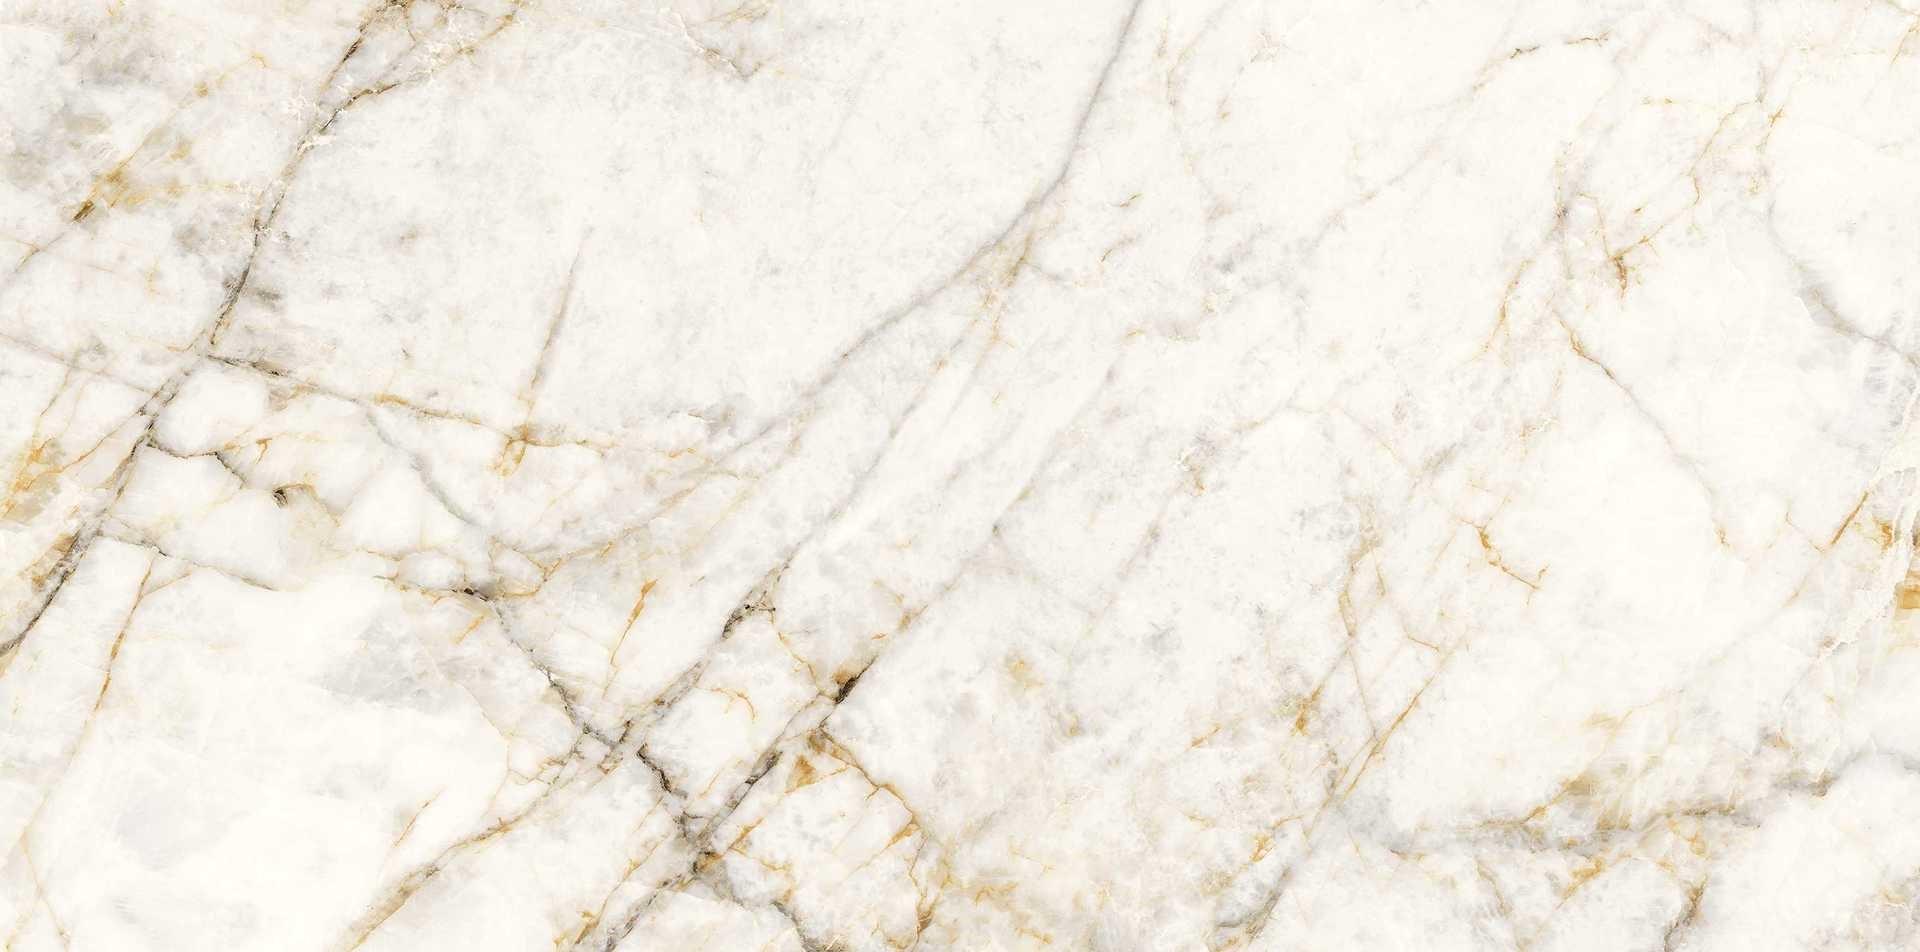 Obklad/dlažba Cuarzo Reno 60x120 cm, lesk